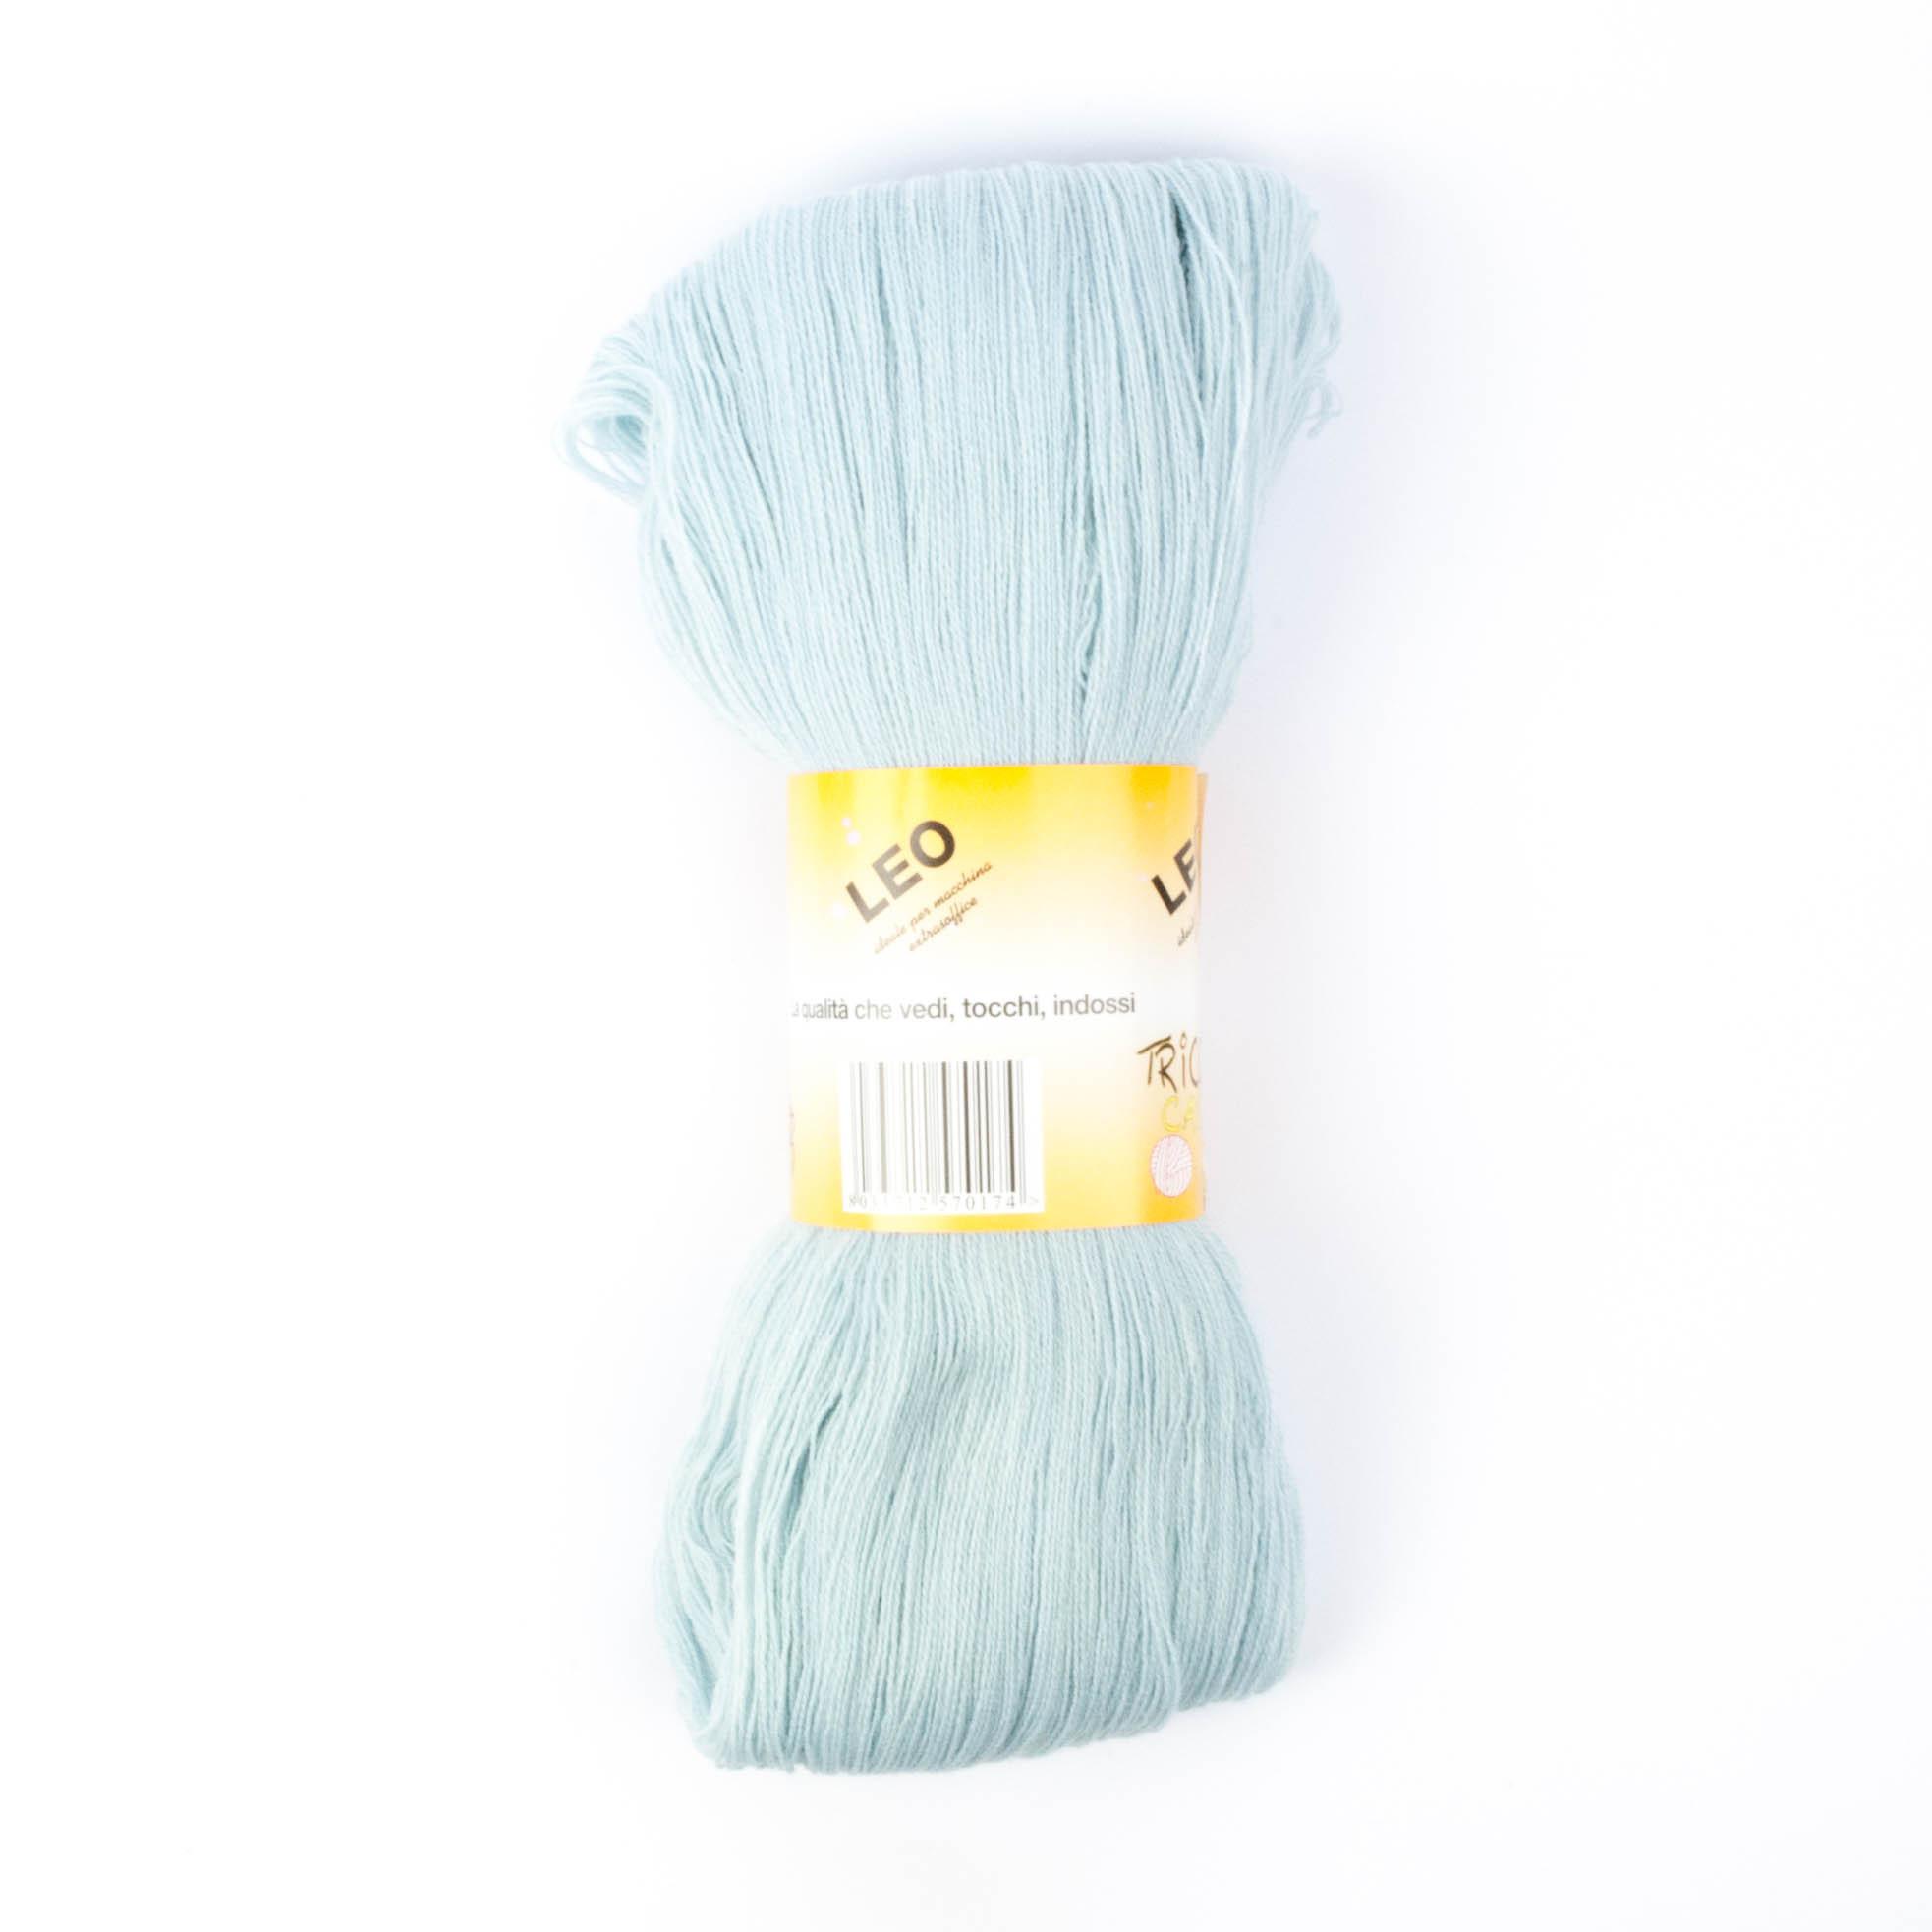 Leo - Matassa misto lana ideale per lavori a mano e macchina - Azzurro Polvere 43